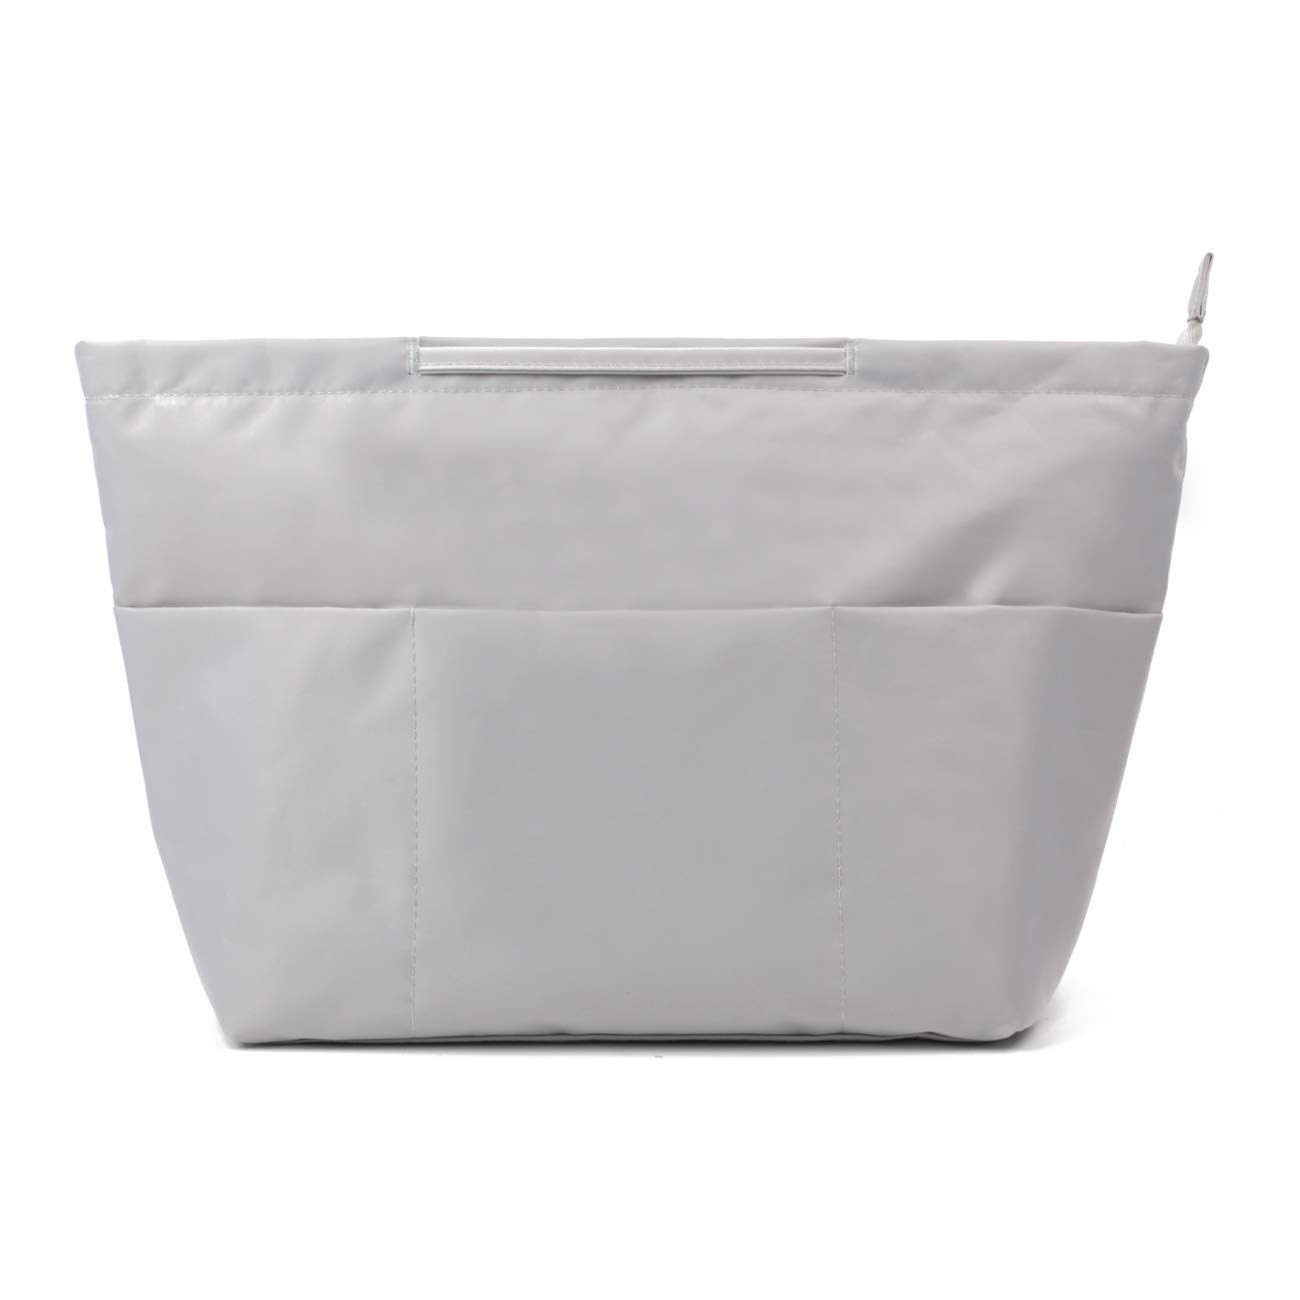 Multi-Pocket Travel Bag in Bag Insert Organizer for Tote Purse Handbag Liner with Handle (Large, Grey)